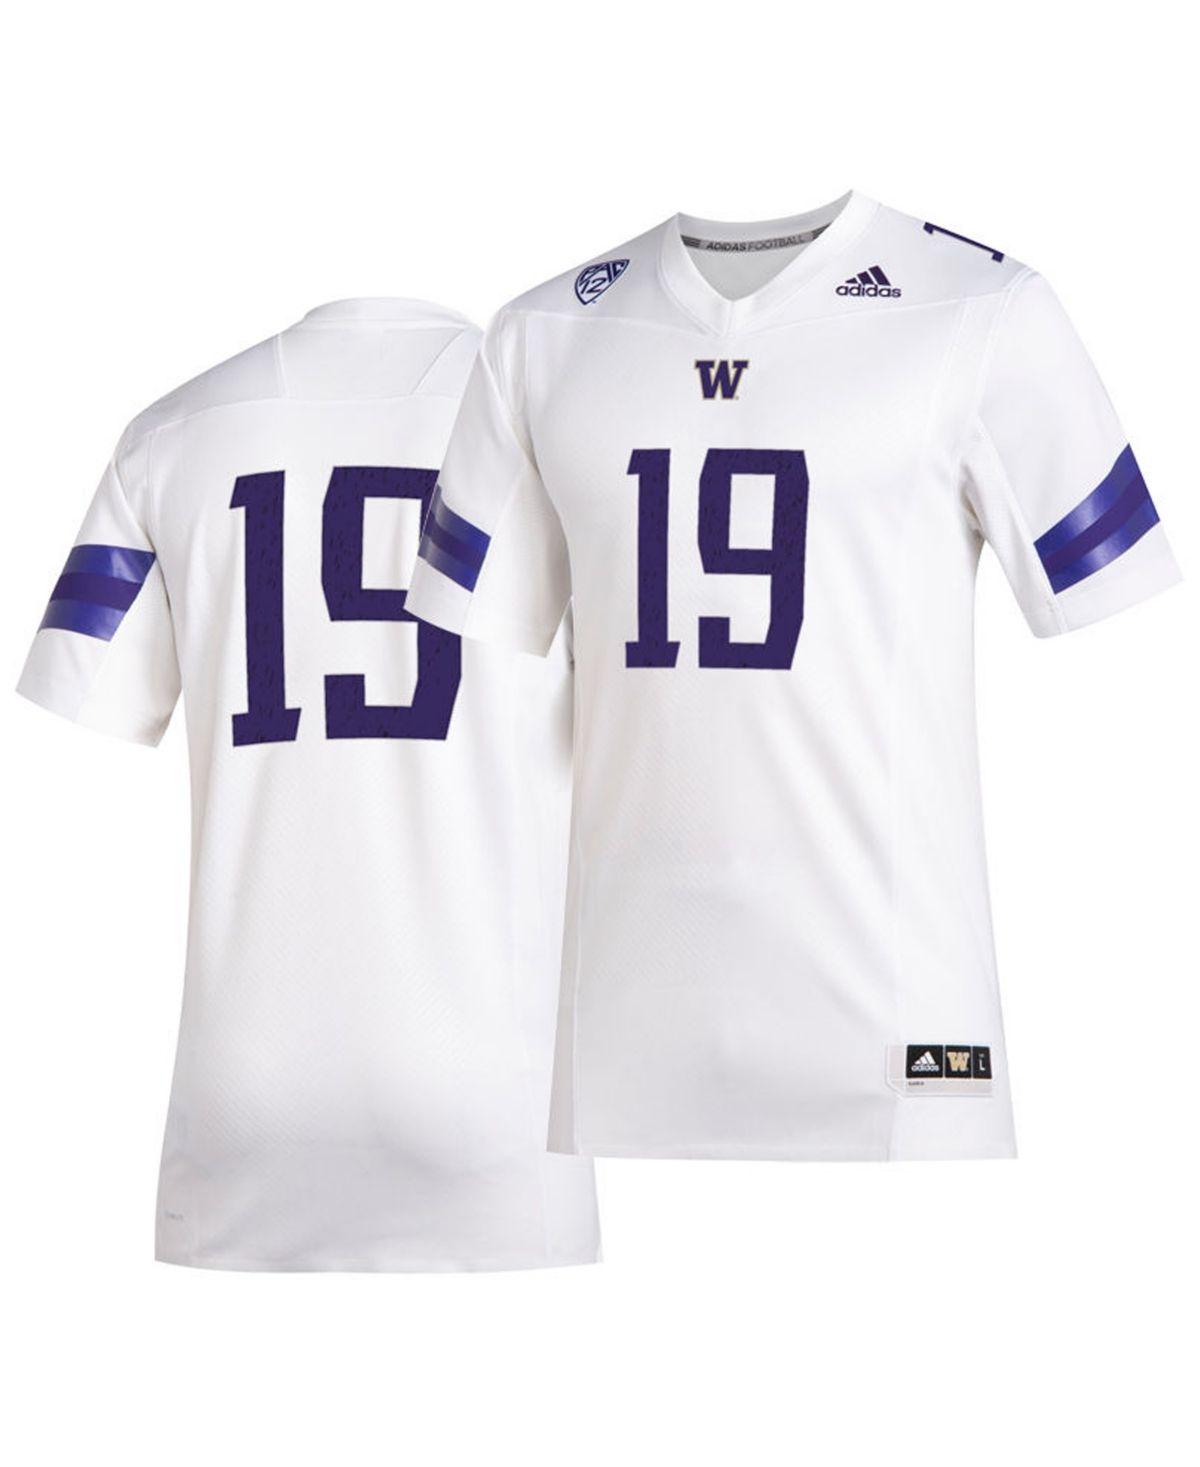 adidas Men's Washington Huskies Football Premier Jersey - White in ...